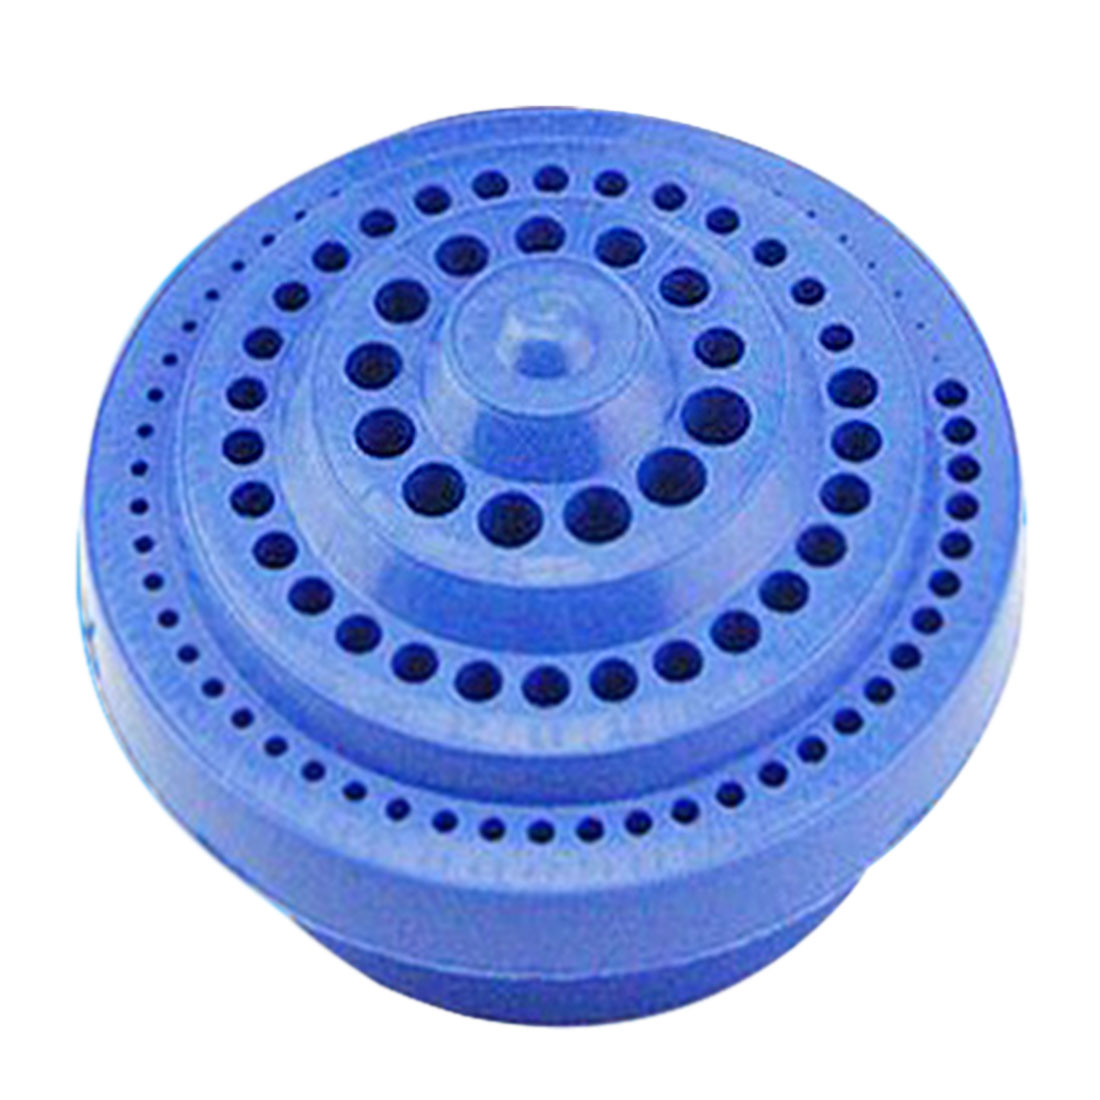 1pcs Round Shape Plastic Hard 100pcs 1-13mm Drill Bit Storage Case Blue